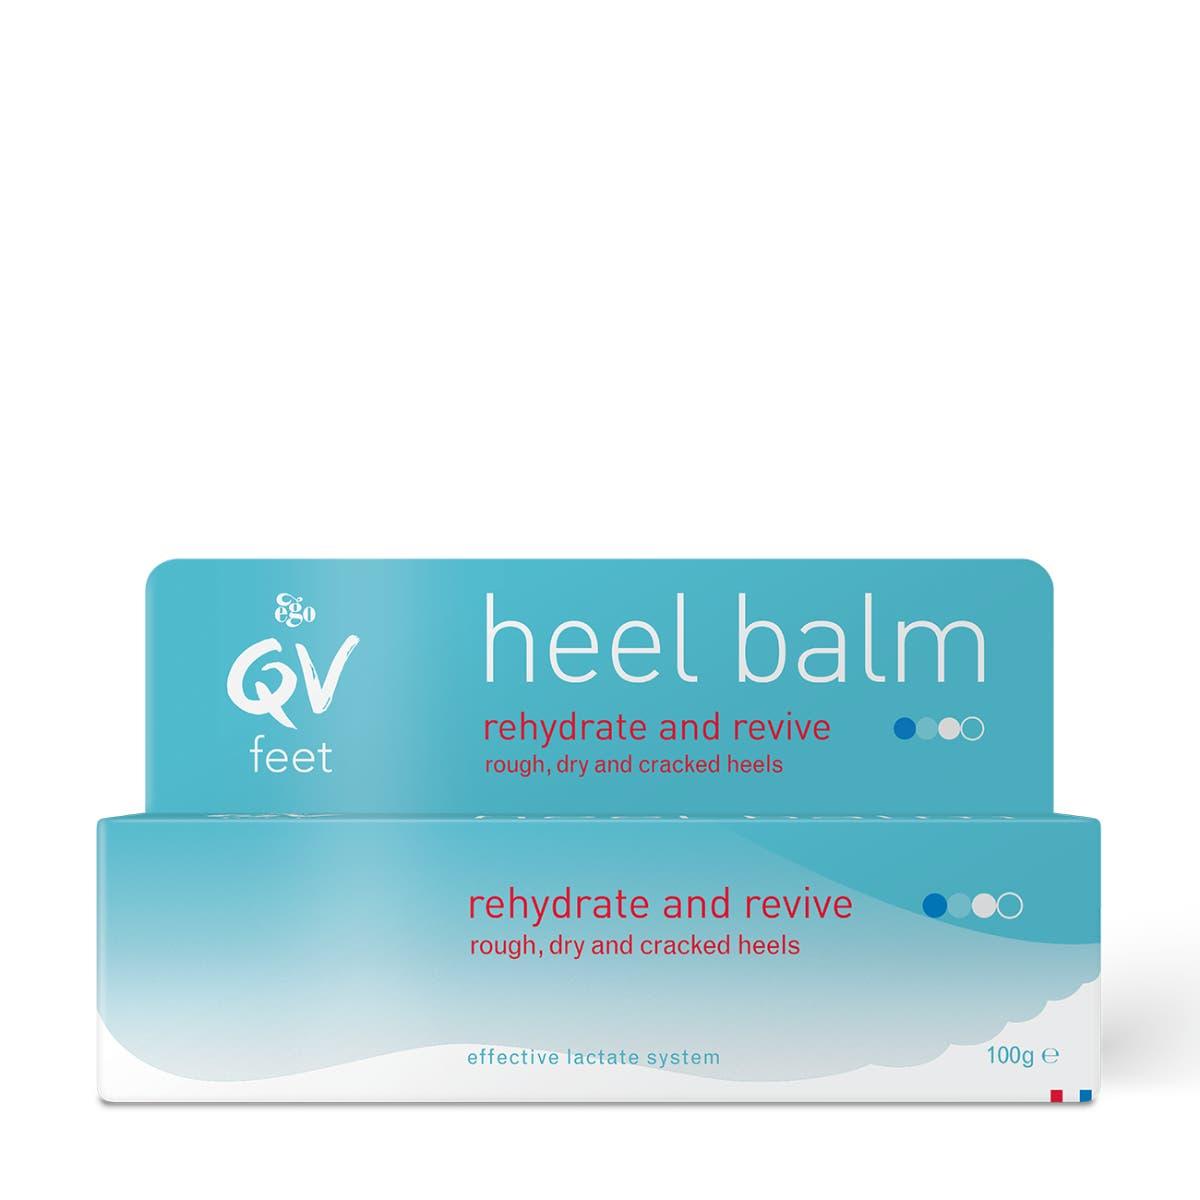 QV Feet Heel Balm